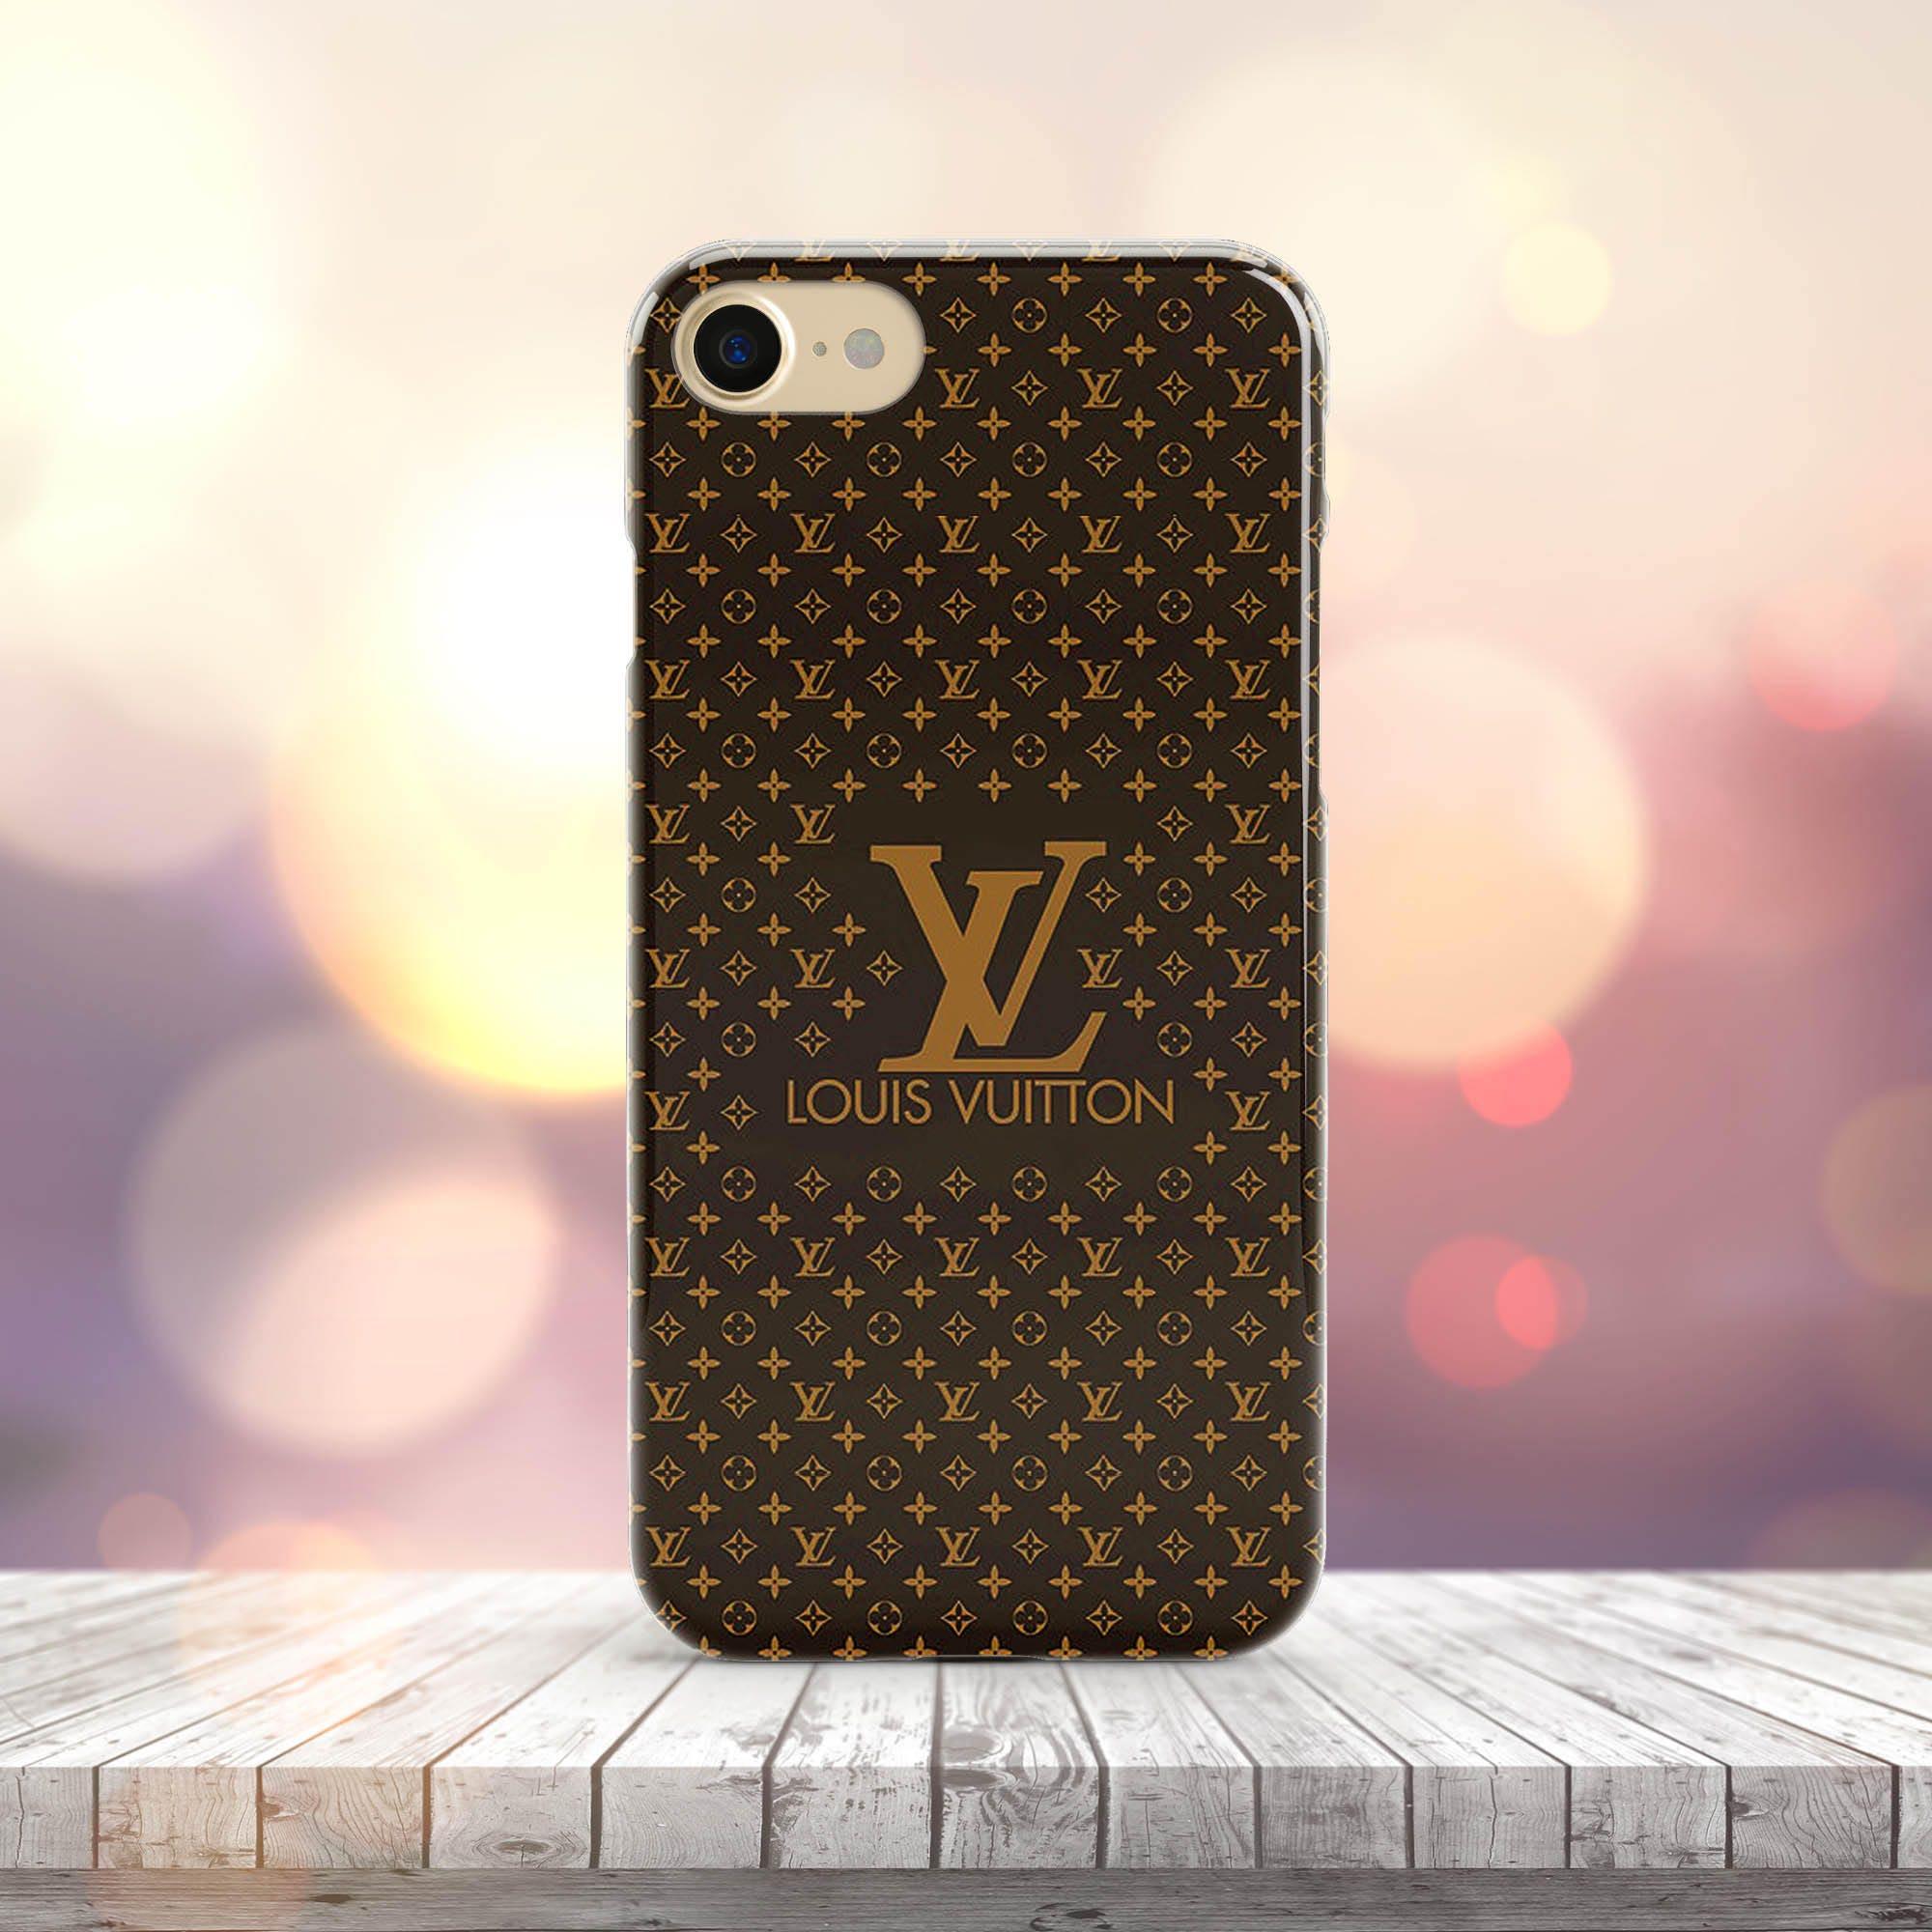 inspired louis vuitton iphone 8 case louis vuitton iphone x etsyWhere To Buy Iphone 8 Cases Iphone 8 Cases Iphone 8 Case Custom Design Best Cases Iphone 8 Leather Case For Iphone 8 Louis Vuitton #5